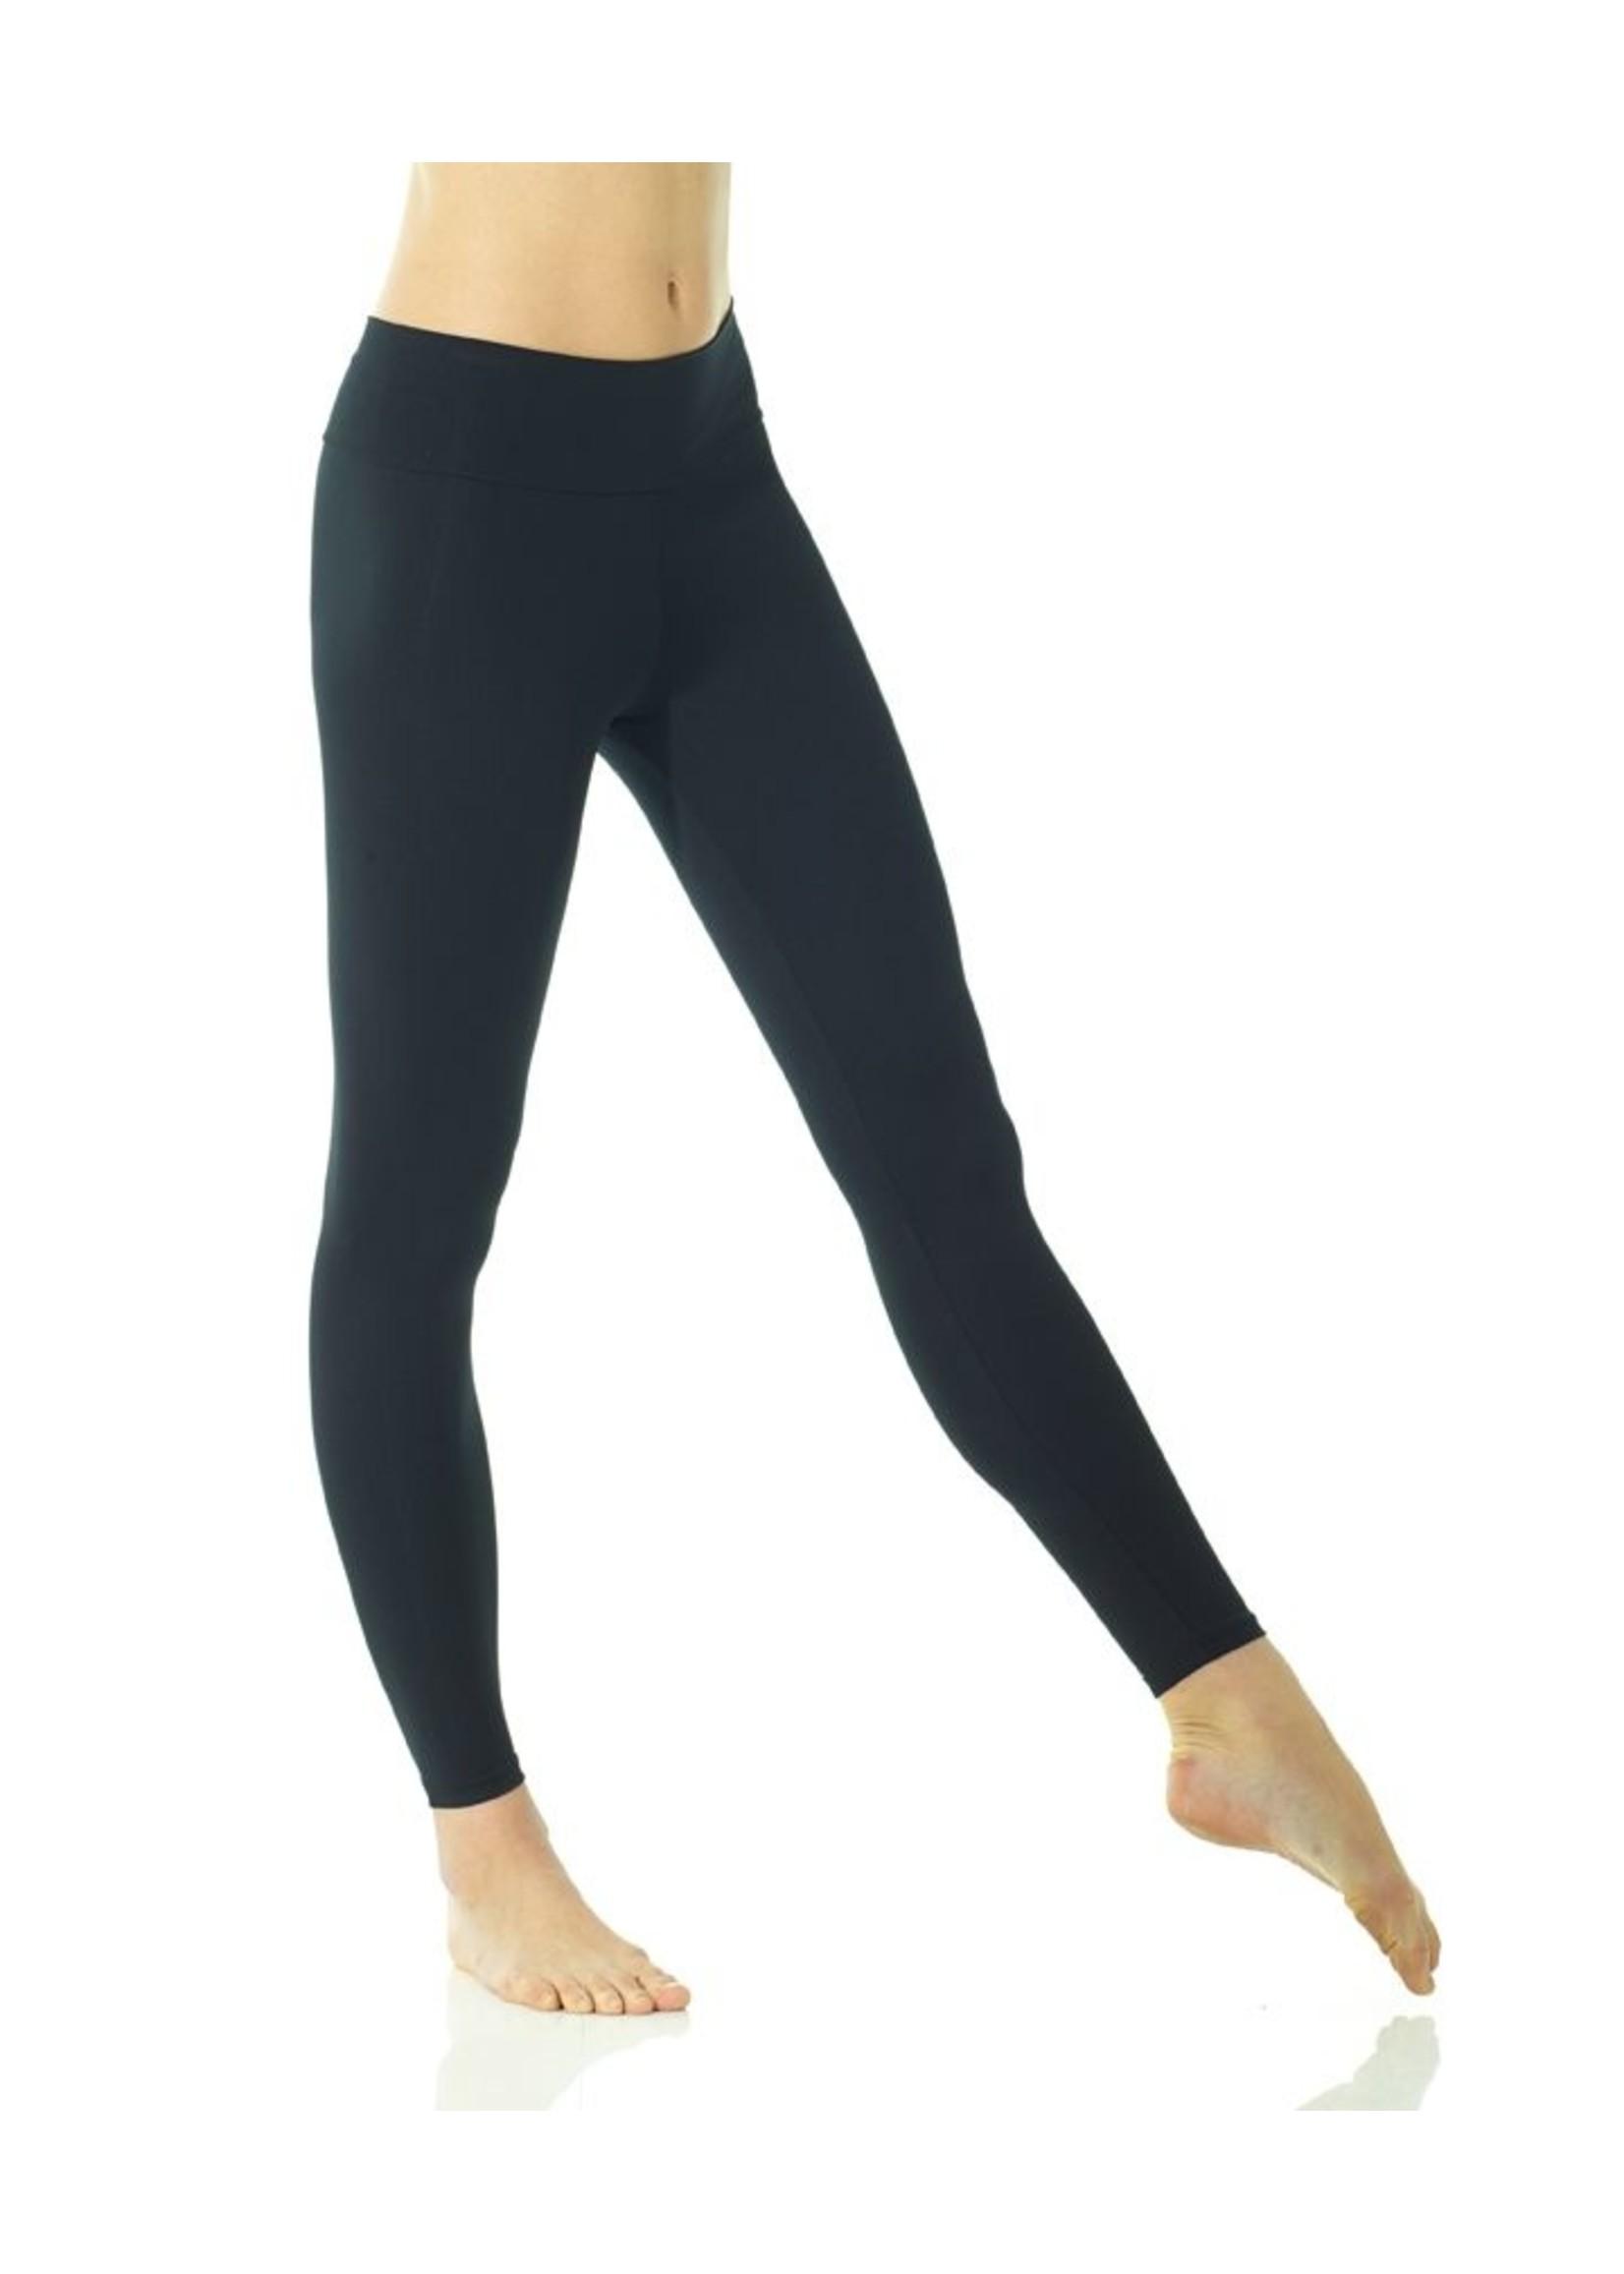 Mondor Legging Matrix - Bande large - Mondor 3529